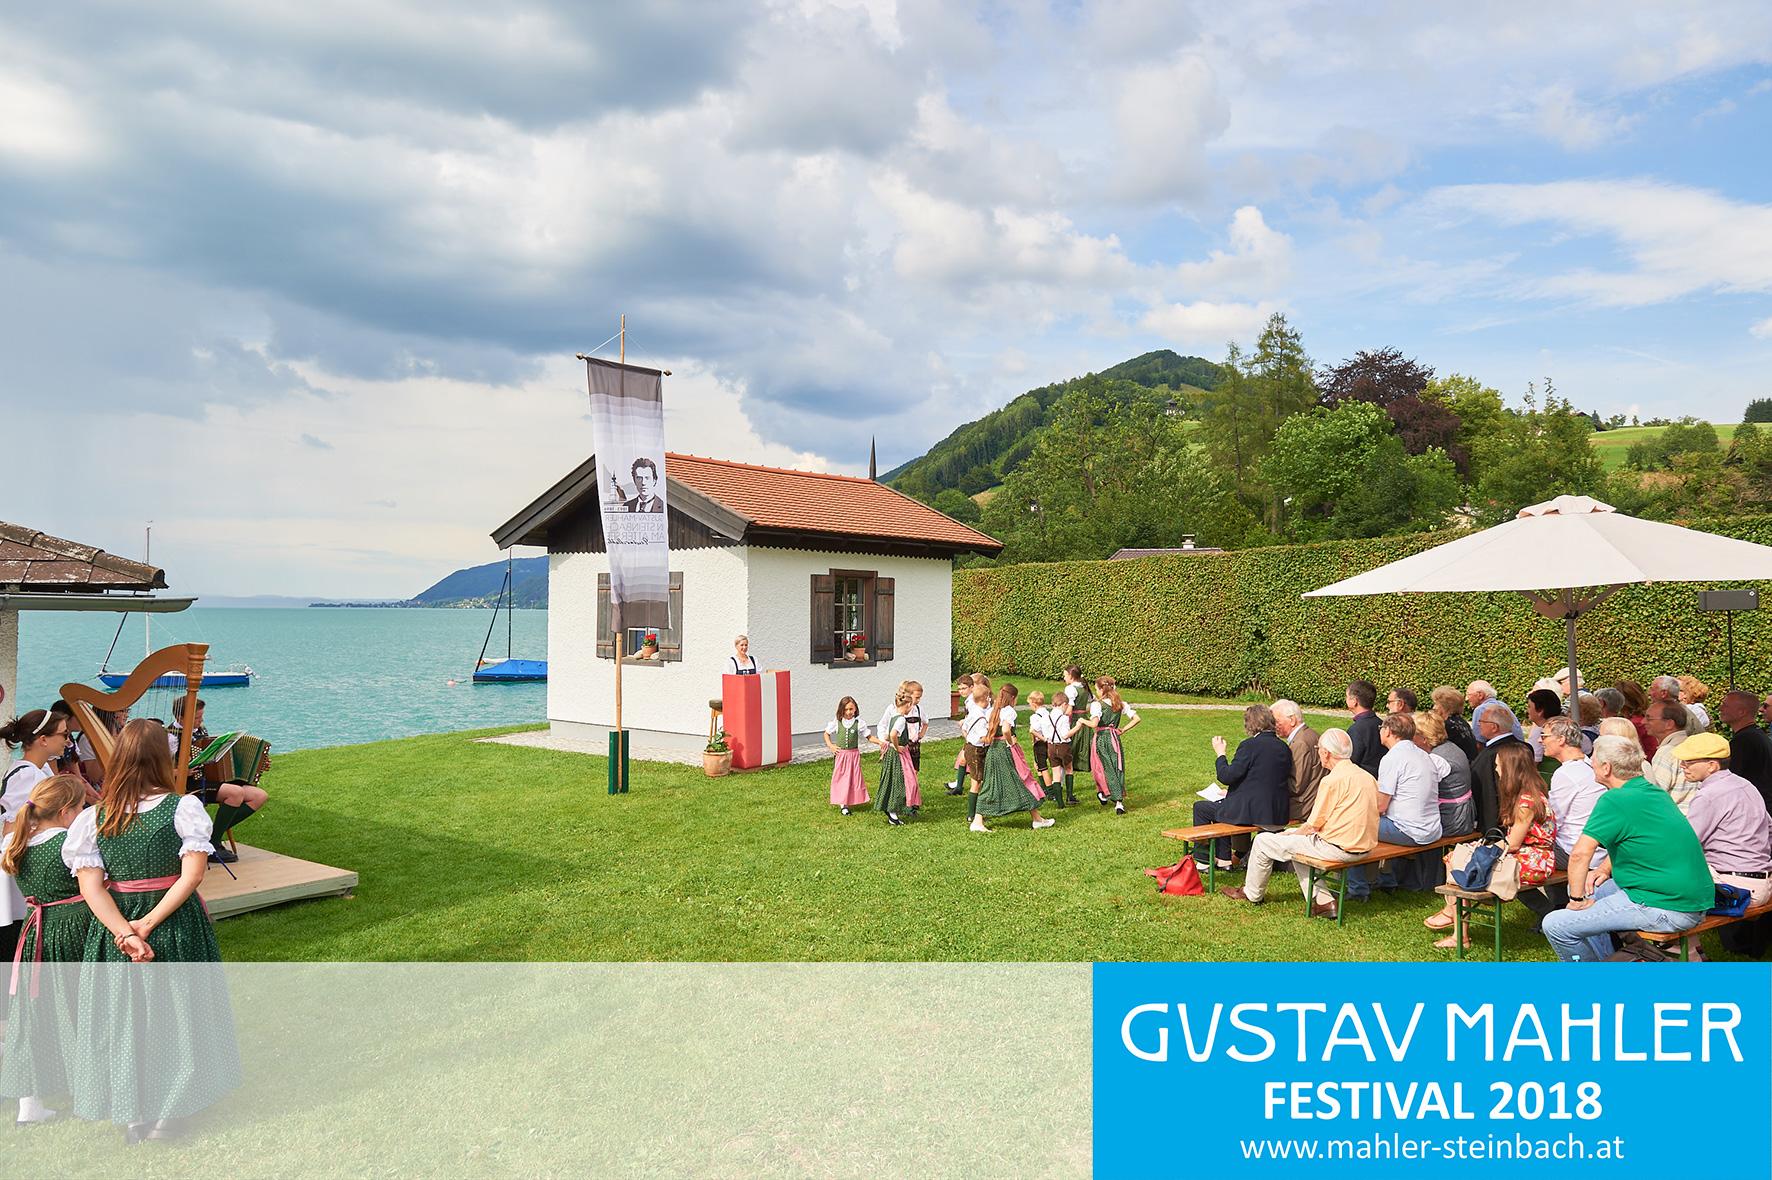 Eröffnung 3. Gustav Mahler Festival Steinbach